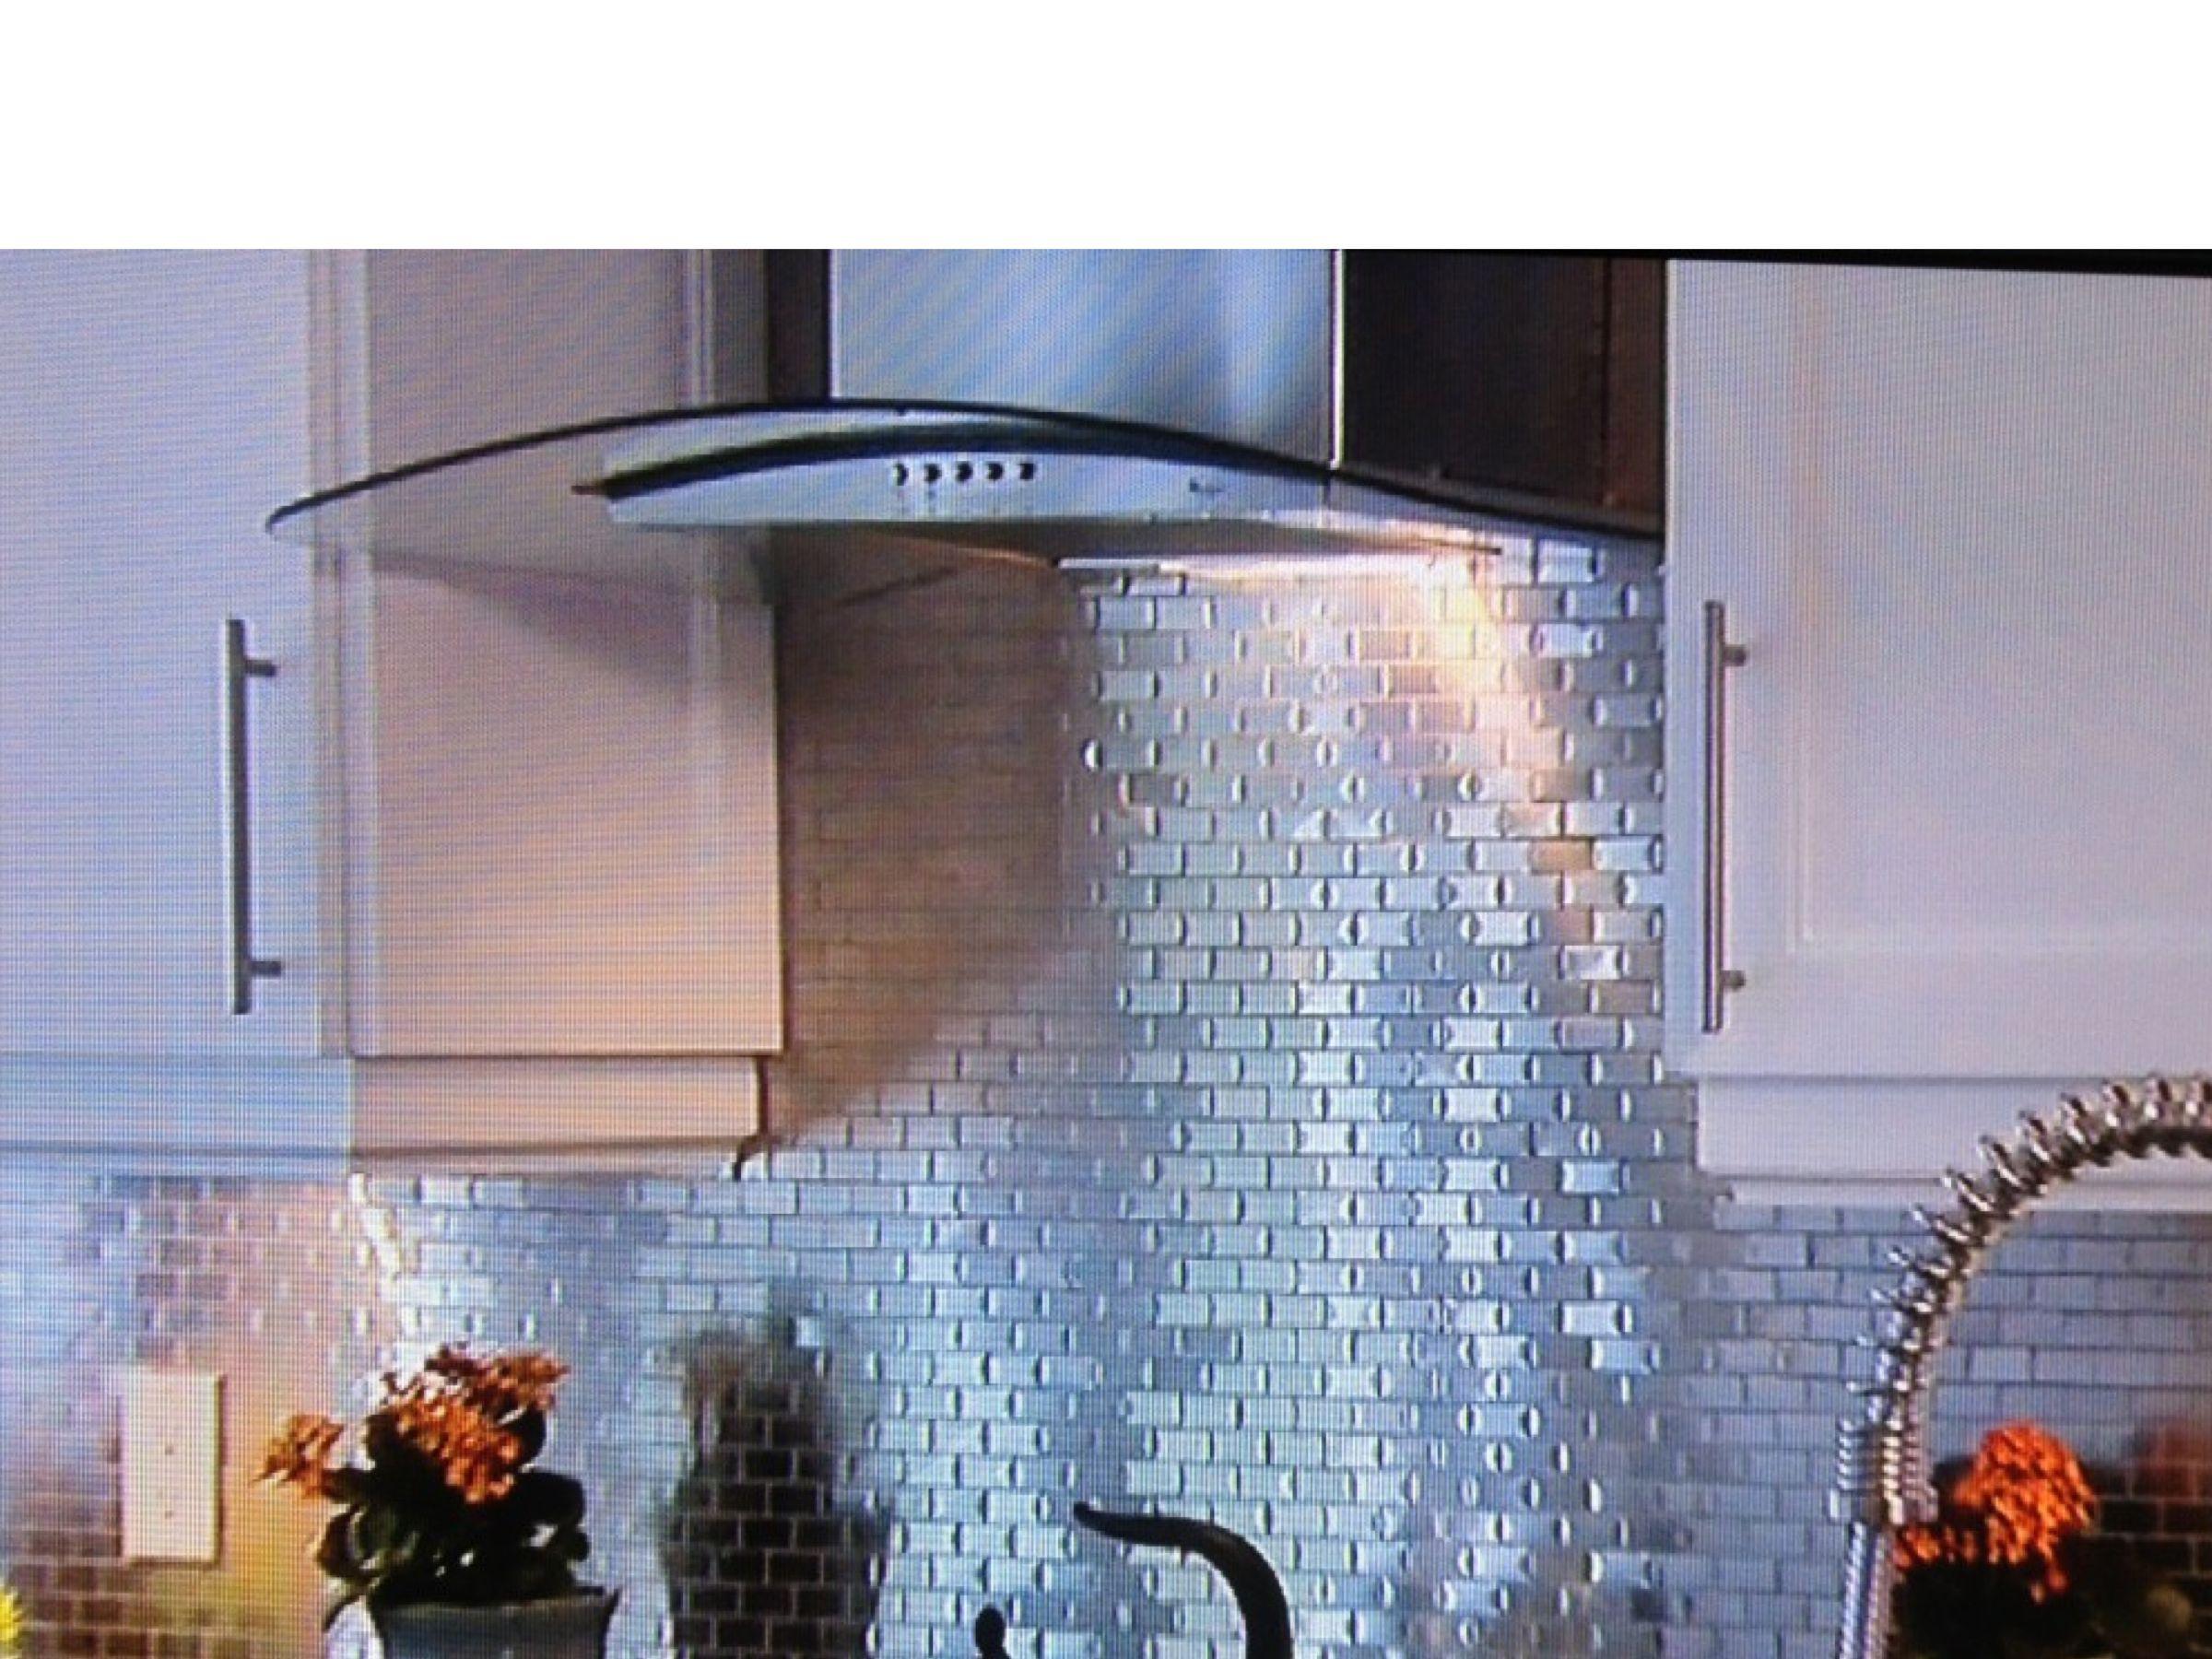 We Are Loving The Way This Tin Tile Backsplash Adds Light And Subtle Sparkle To This Bea Kitchen Backsplash Metal Tiles Metallic Backsplash Tin Tile Backsplash